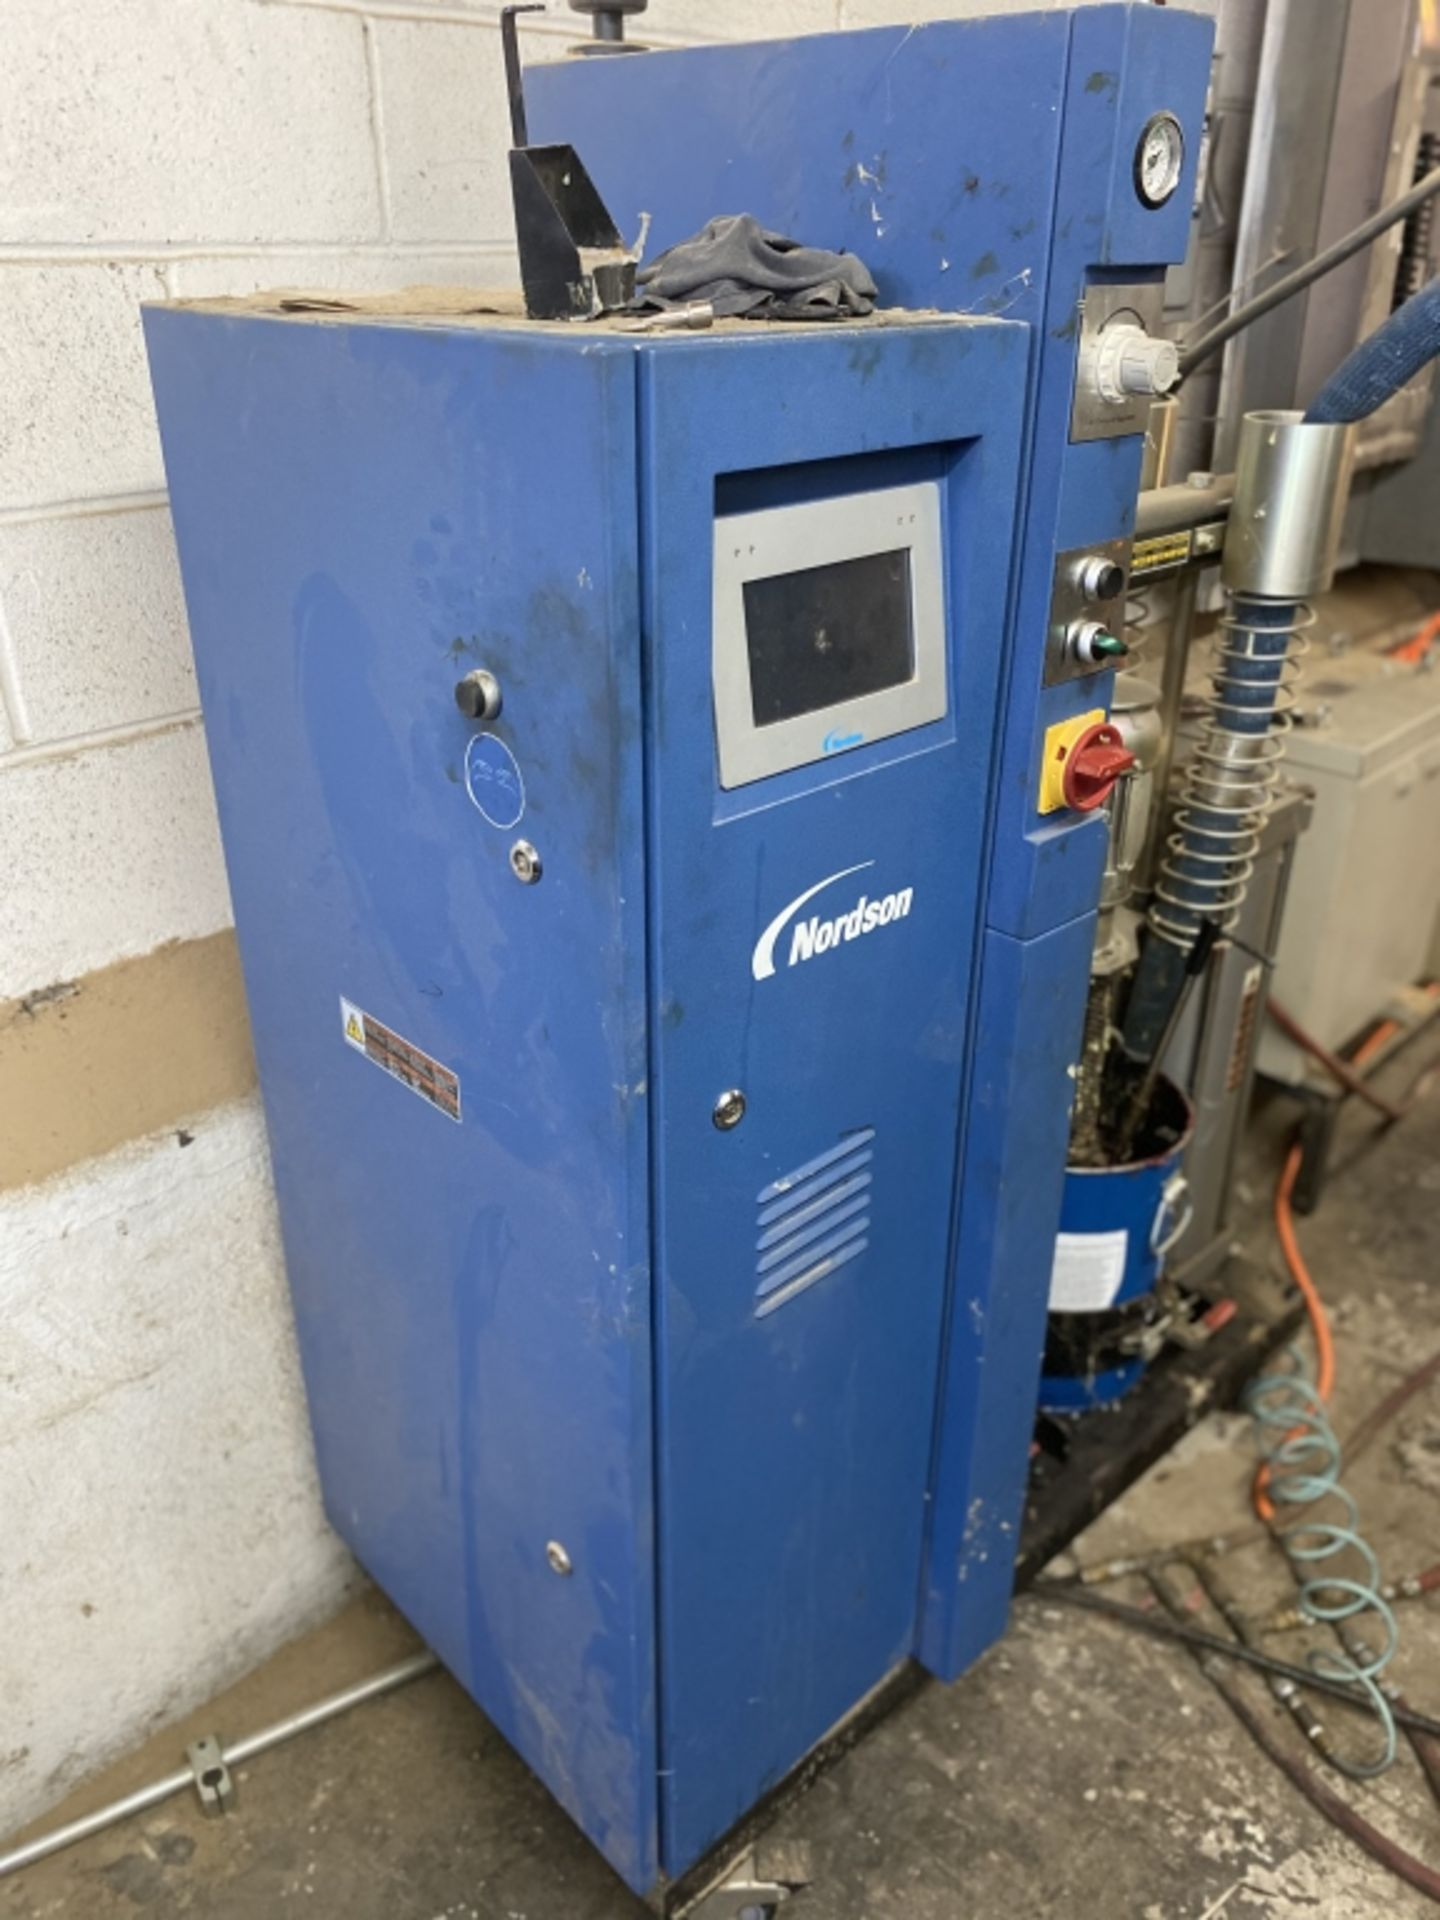 Lot 1013 - Nordson Glue Melter & Pump